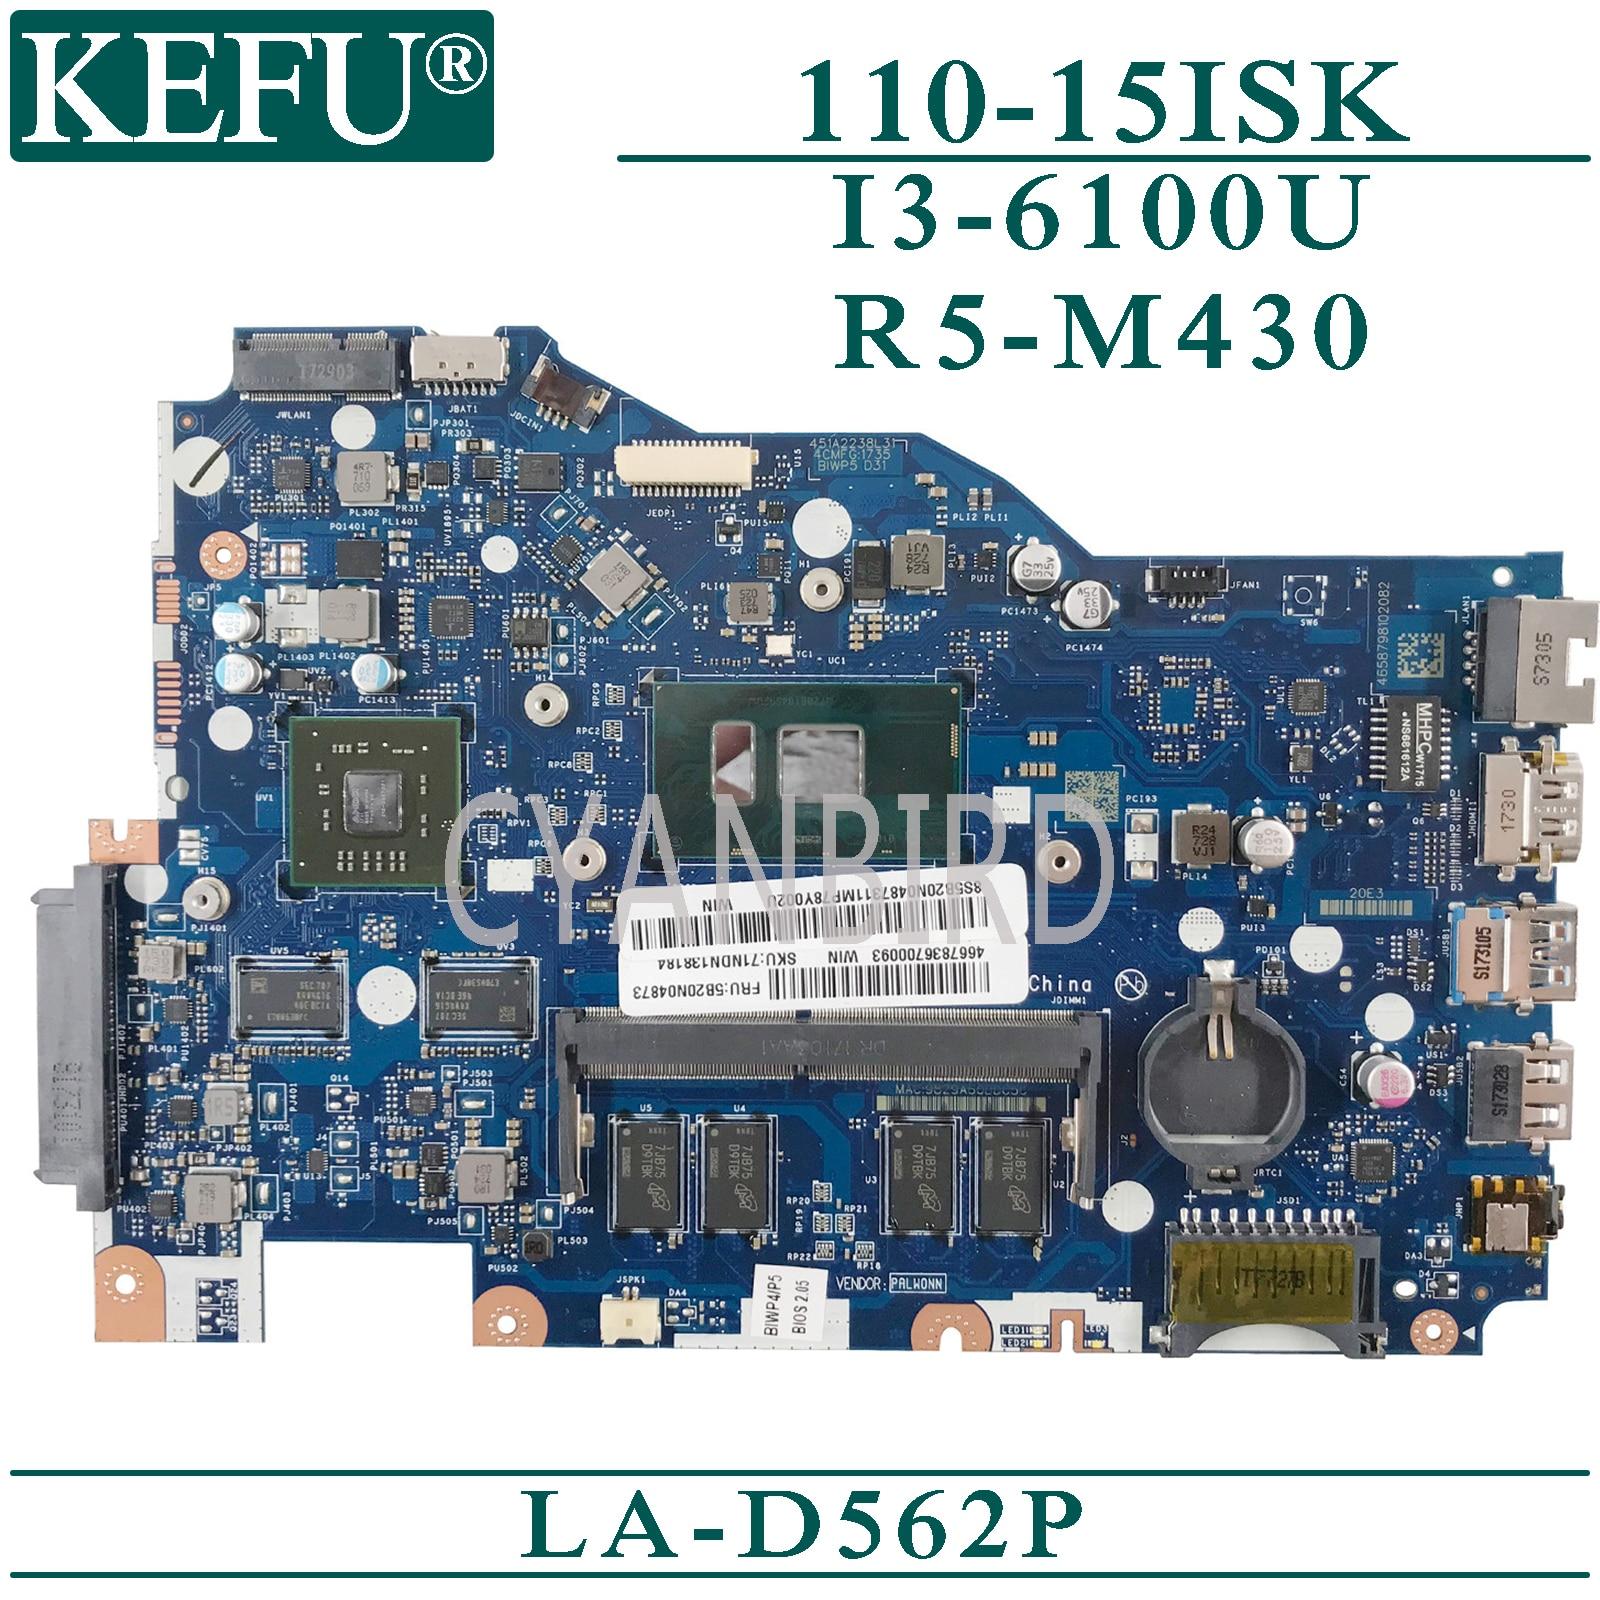 KEFU LA-D562P اللوحة الأصلية لينوفو 110-15ISK مع 4GB-RAM I3-6100U R5-M240 اللوحة المحمول